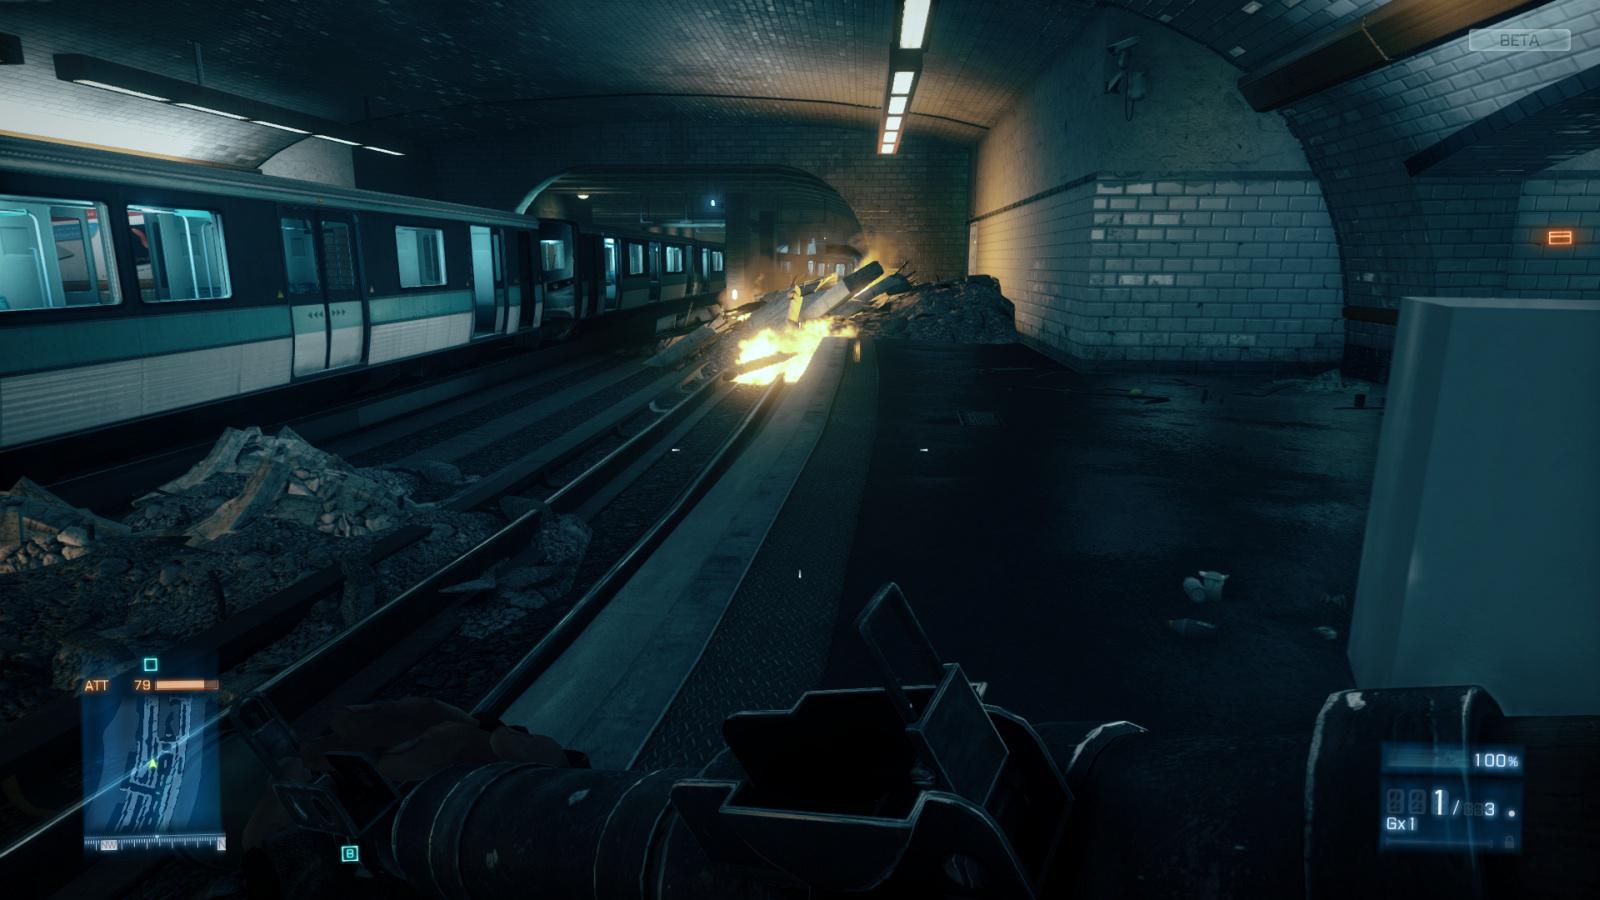 Beta Battlefieldu 3 je live – hratelnost, grafika, galerie 52423